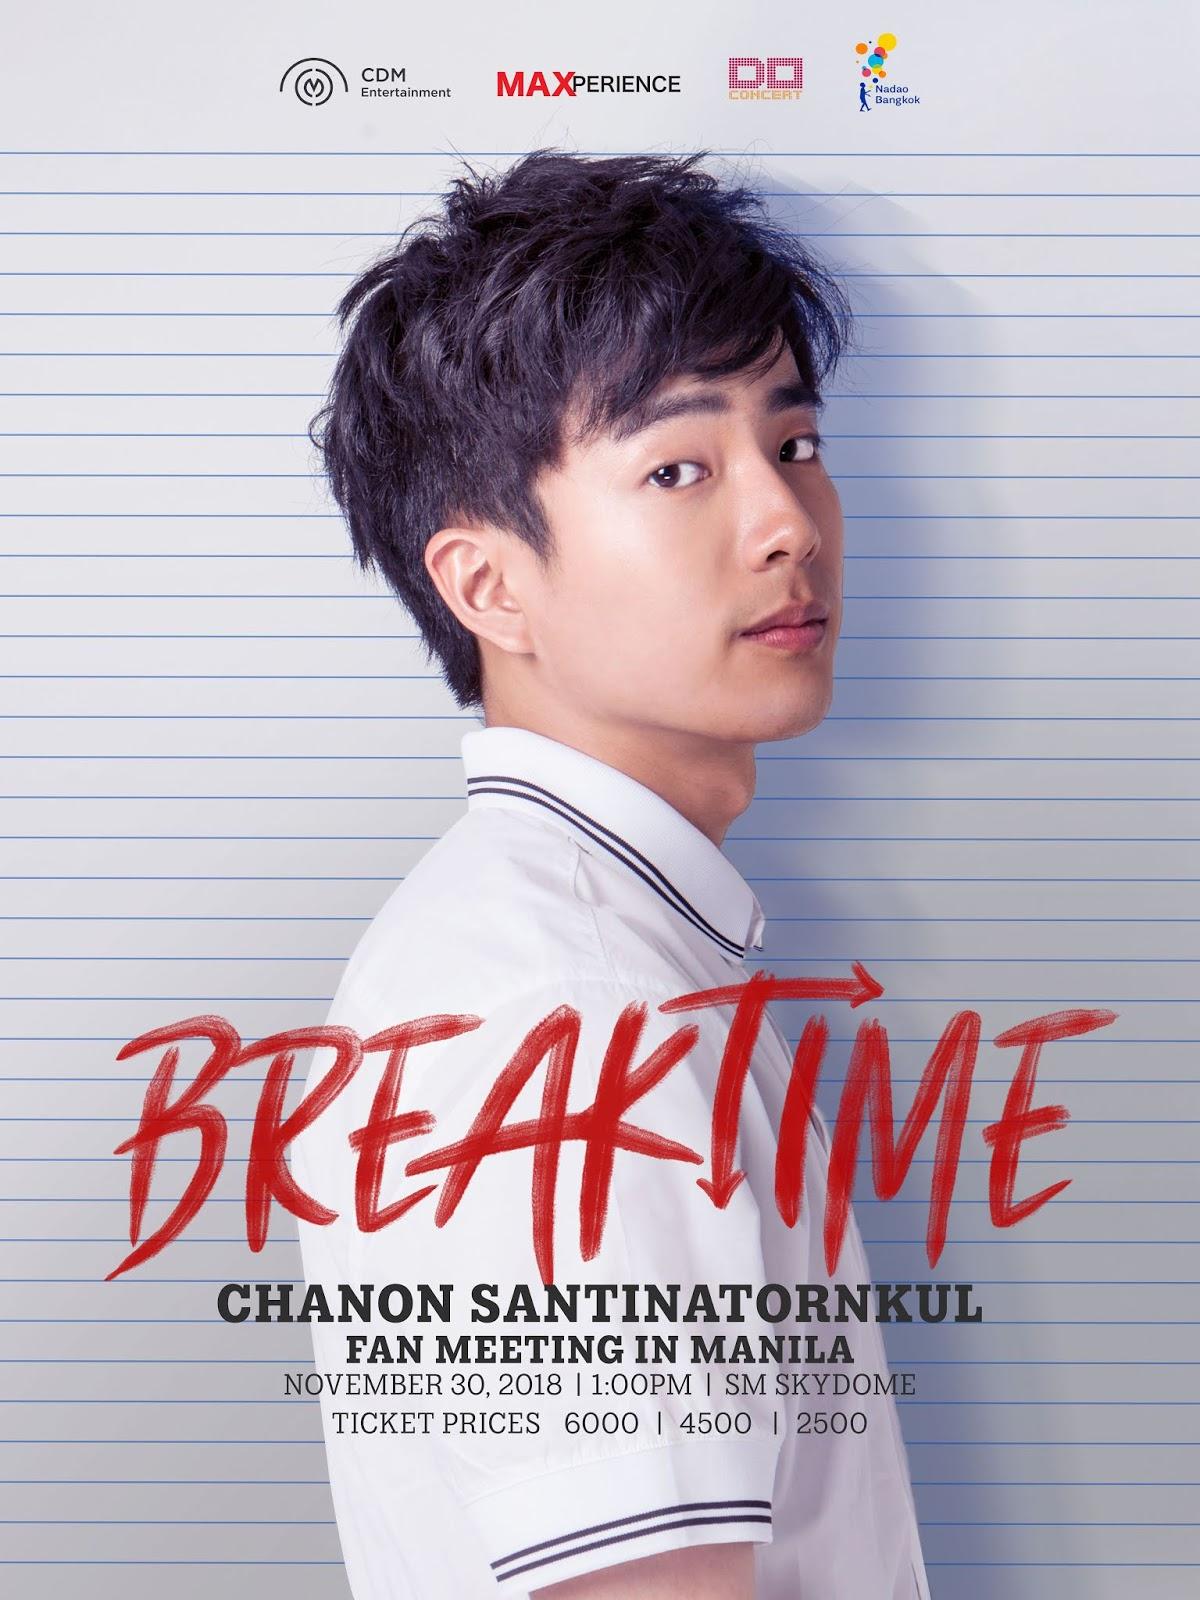 Bad Genius Star Chanon Santinatornkul is Coming to Manila